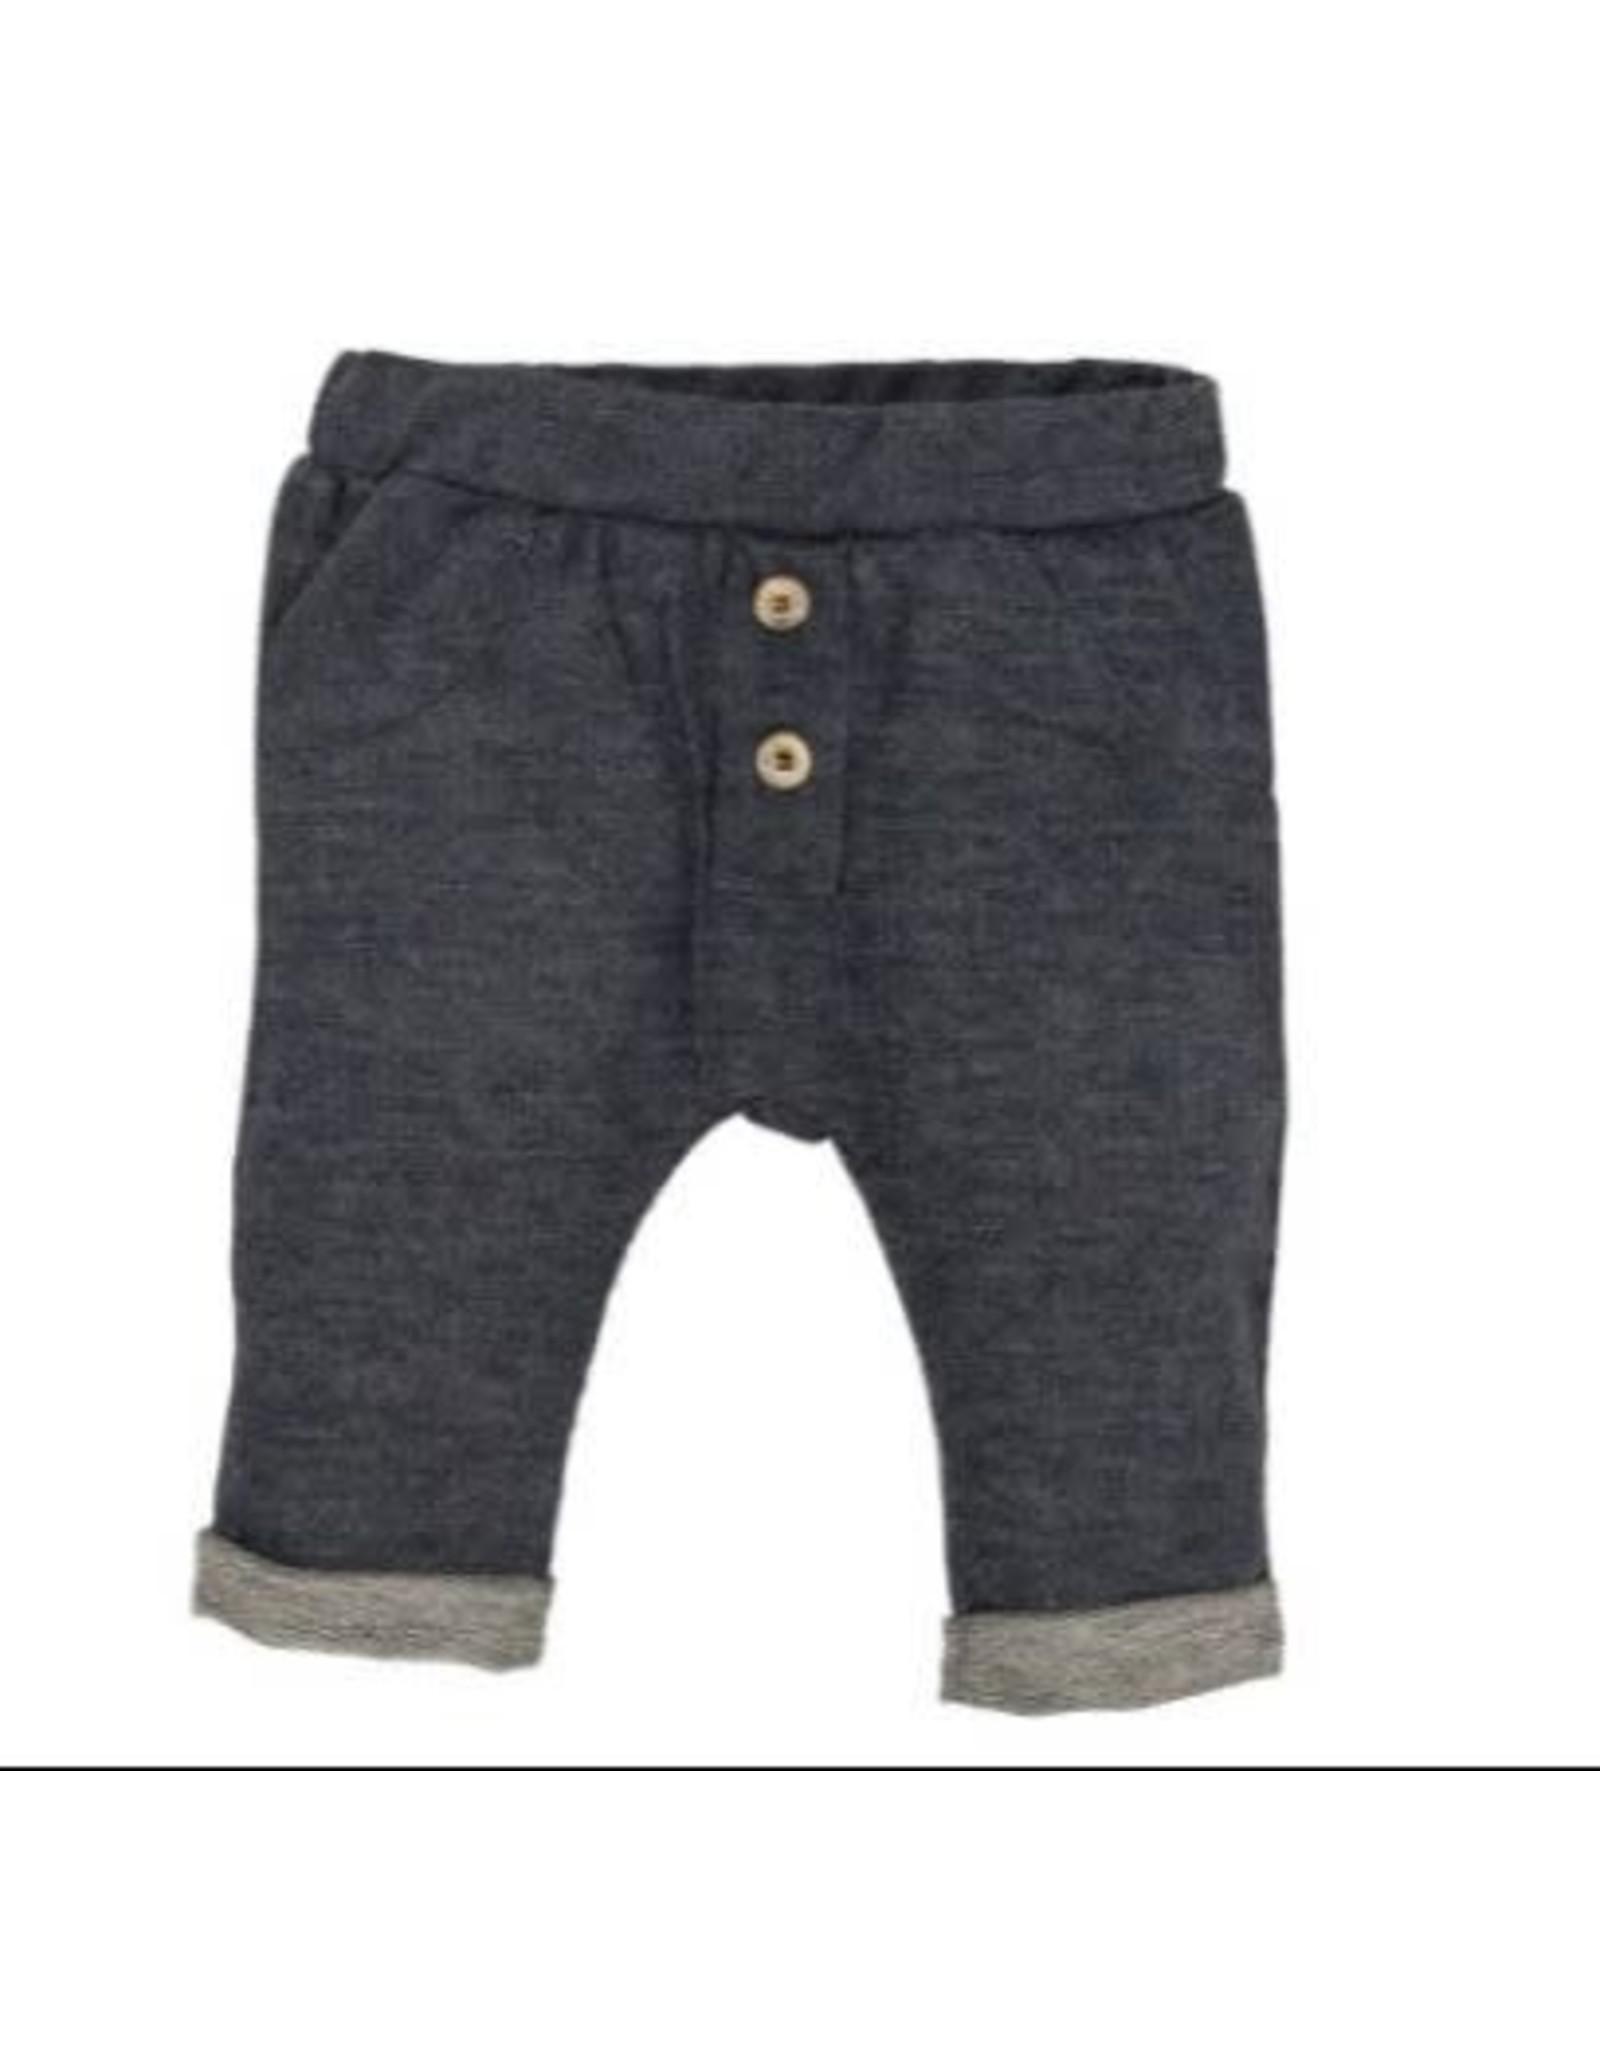 EMC Fleece Trousers